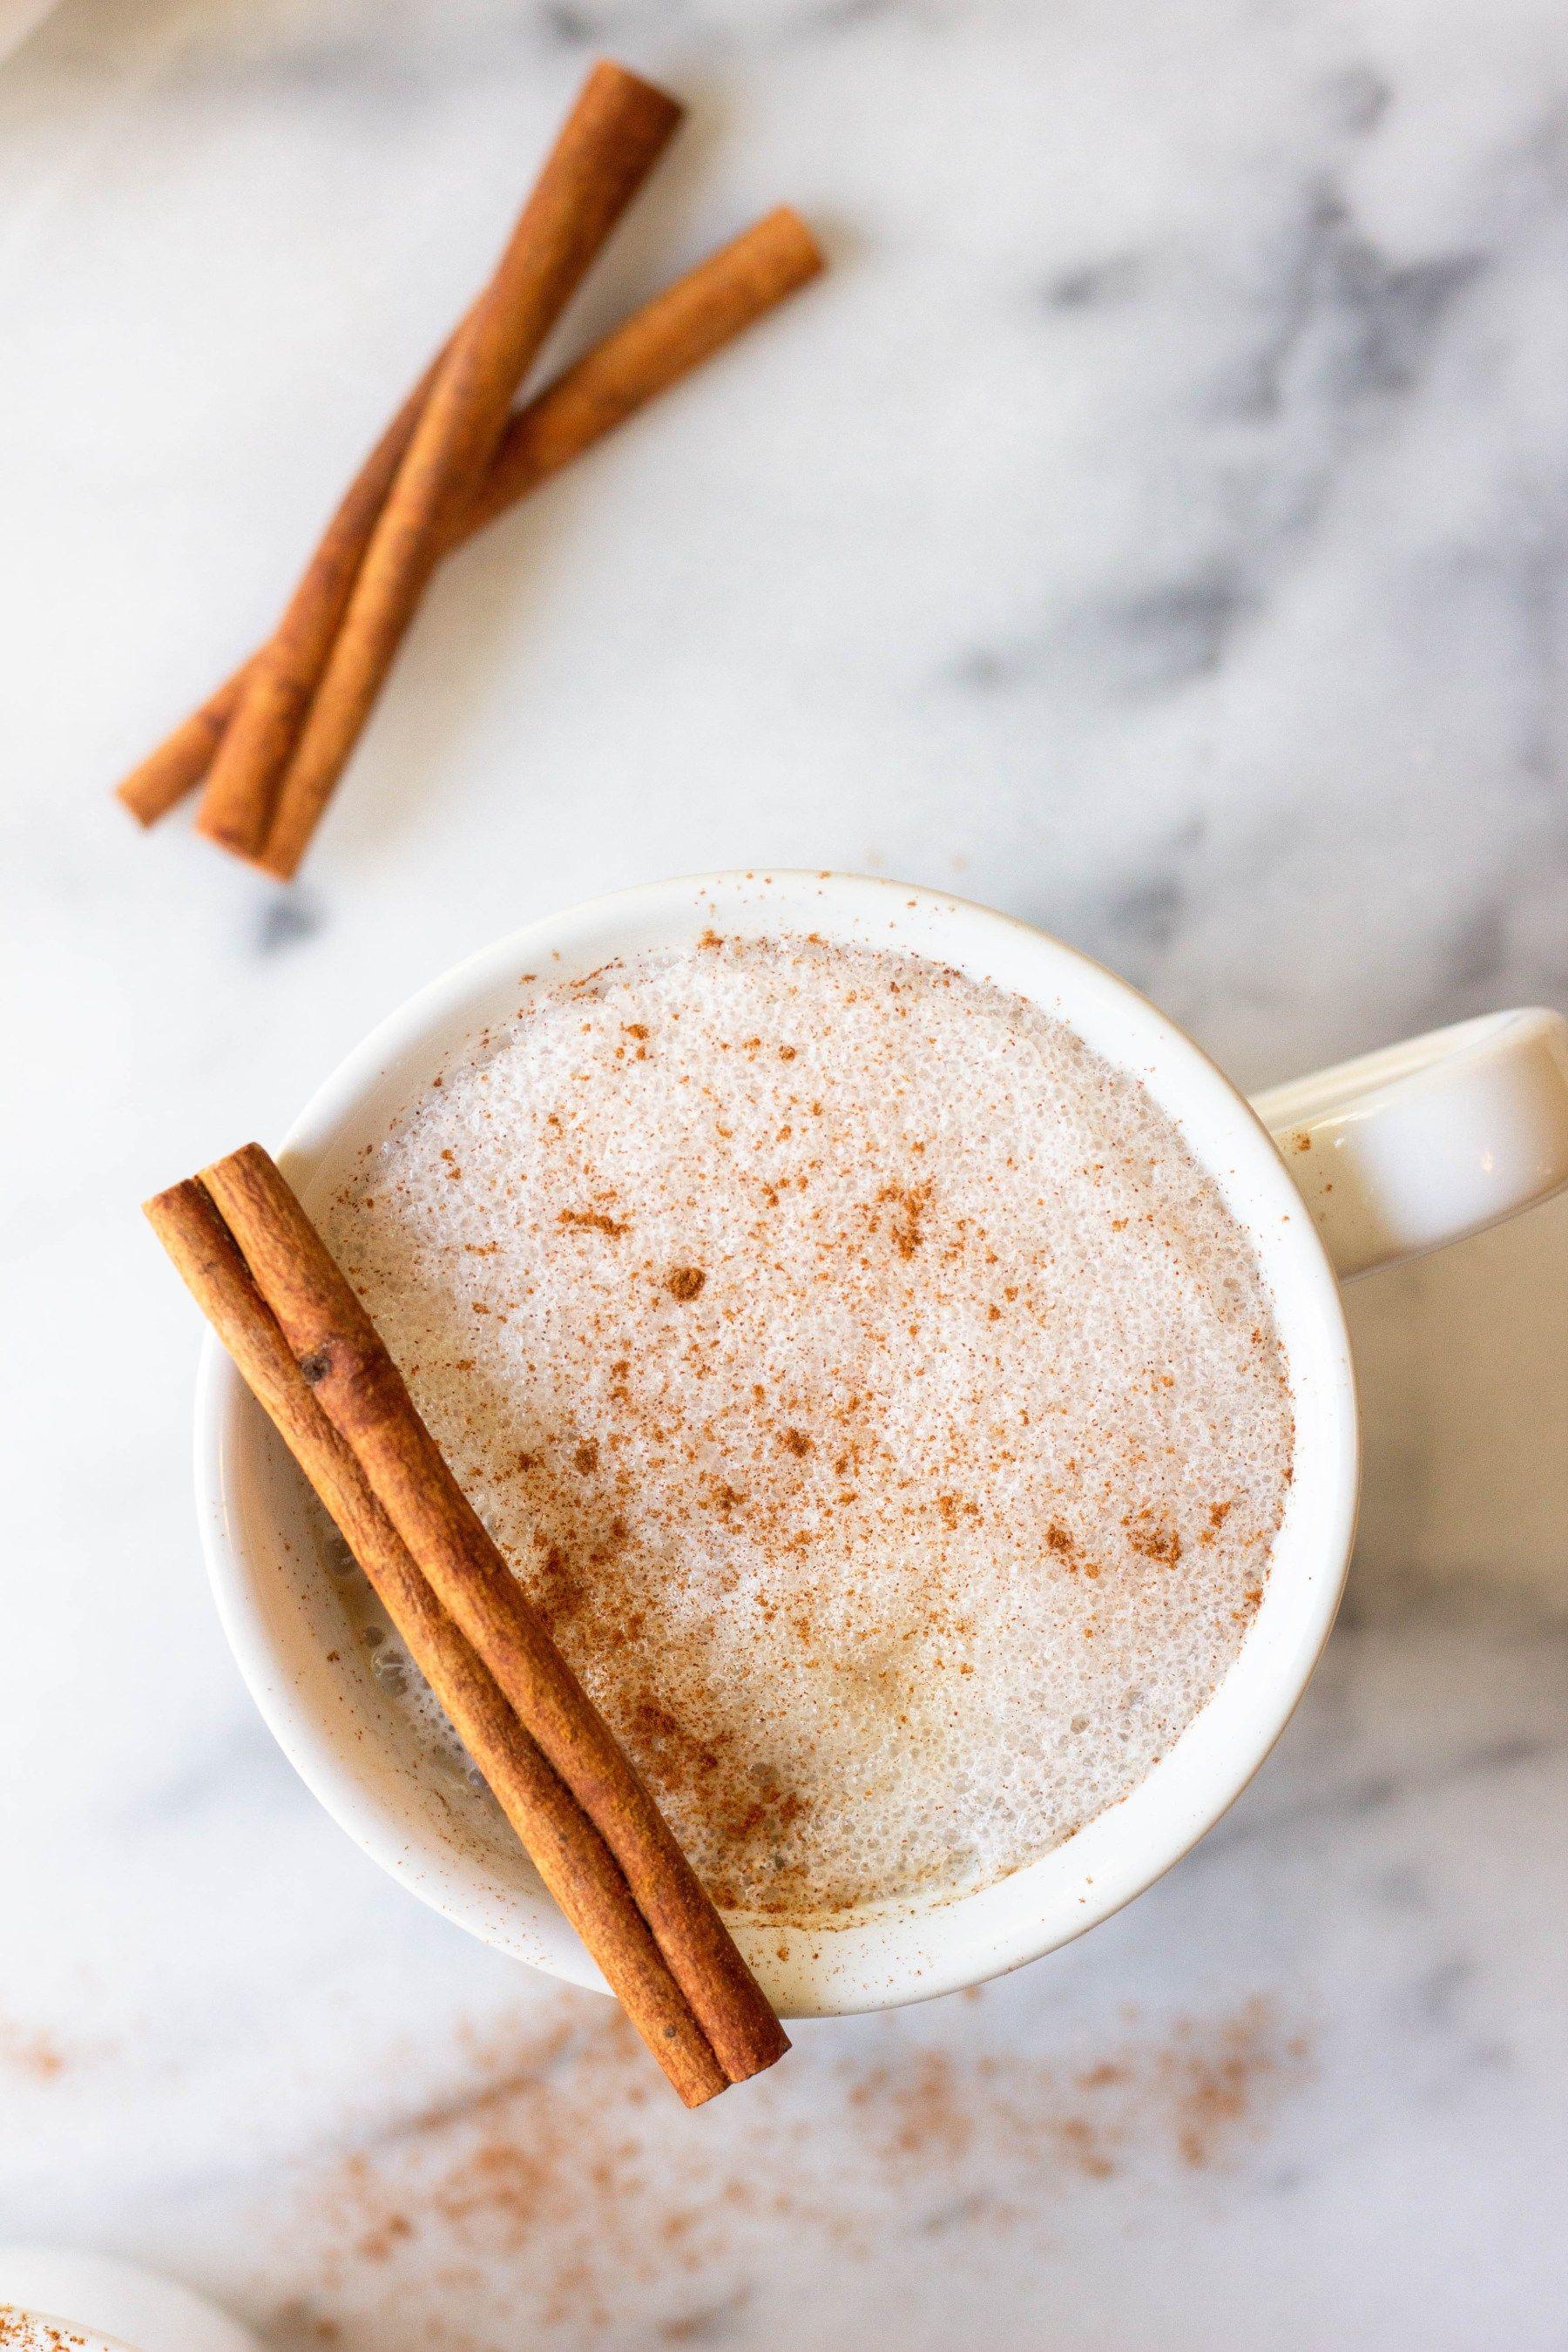 Better Than Starbucks 3 Ingredient Frothy Vanilla Latte